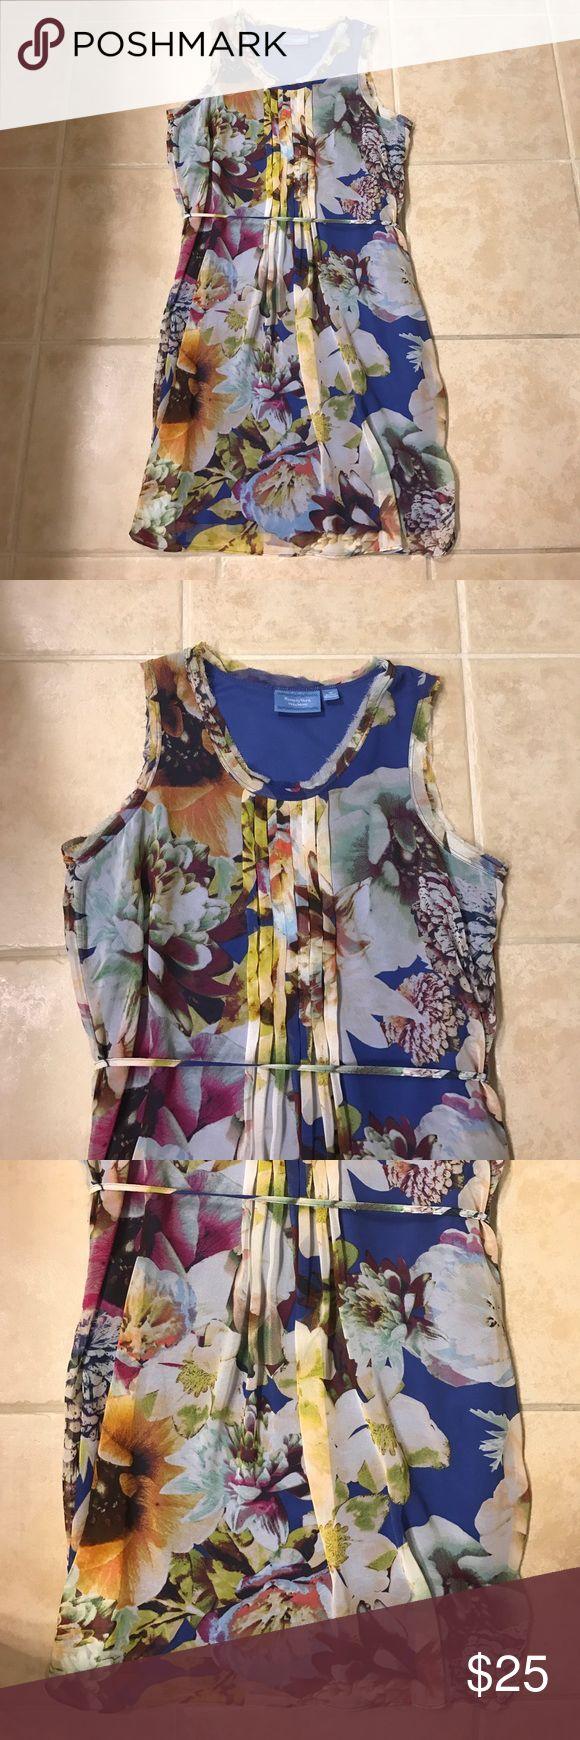 Simply Vera Vera Wang floral dress size M Simply Vera Vera Wang floral dress size M Simply Vera Vera Wang Dresses